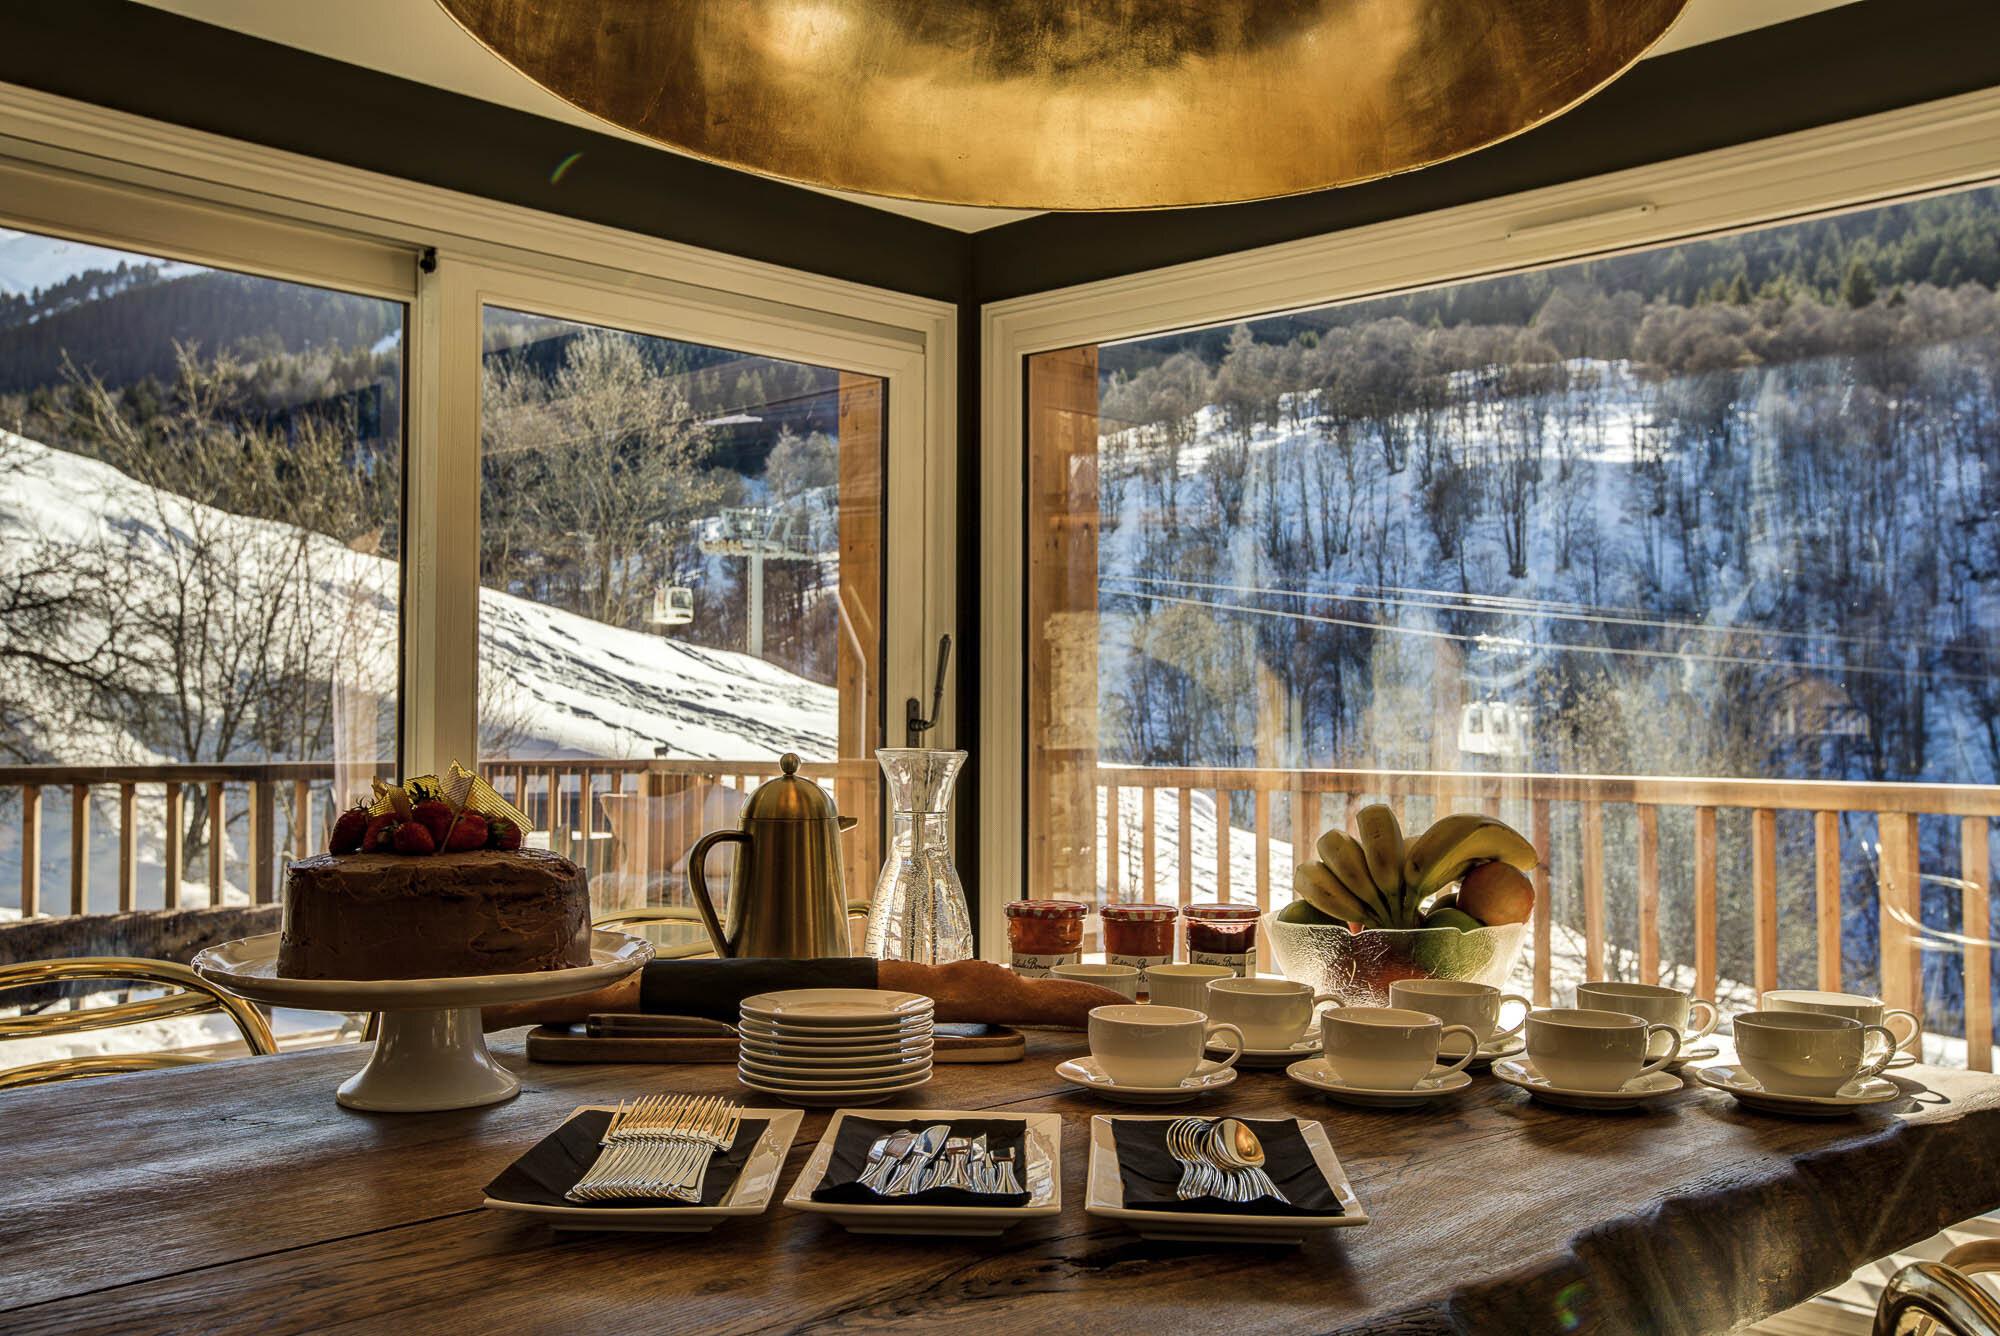 tg-ski-luxury-chalet-lightbowne-meribel-020-2